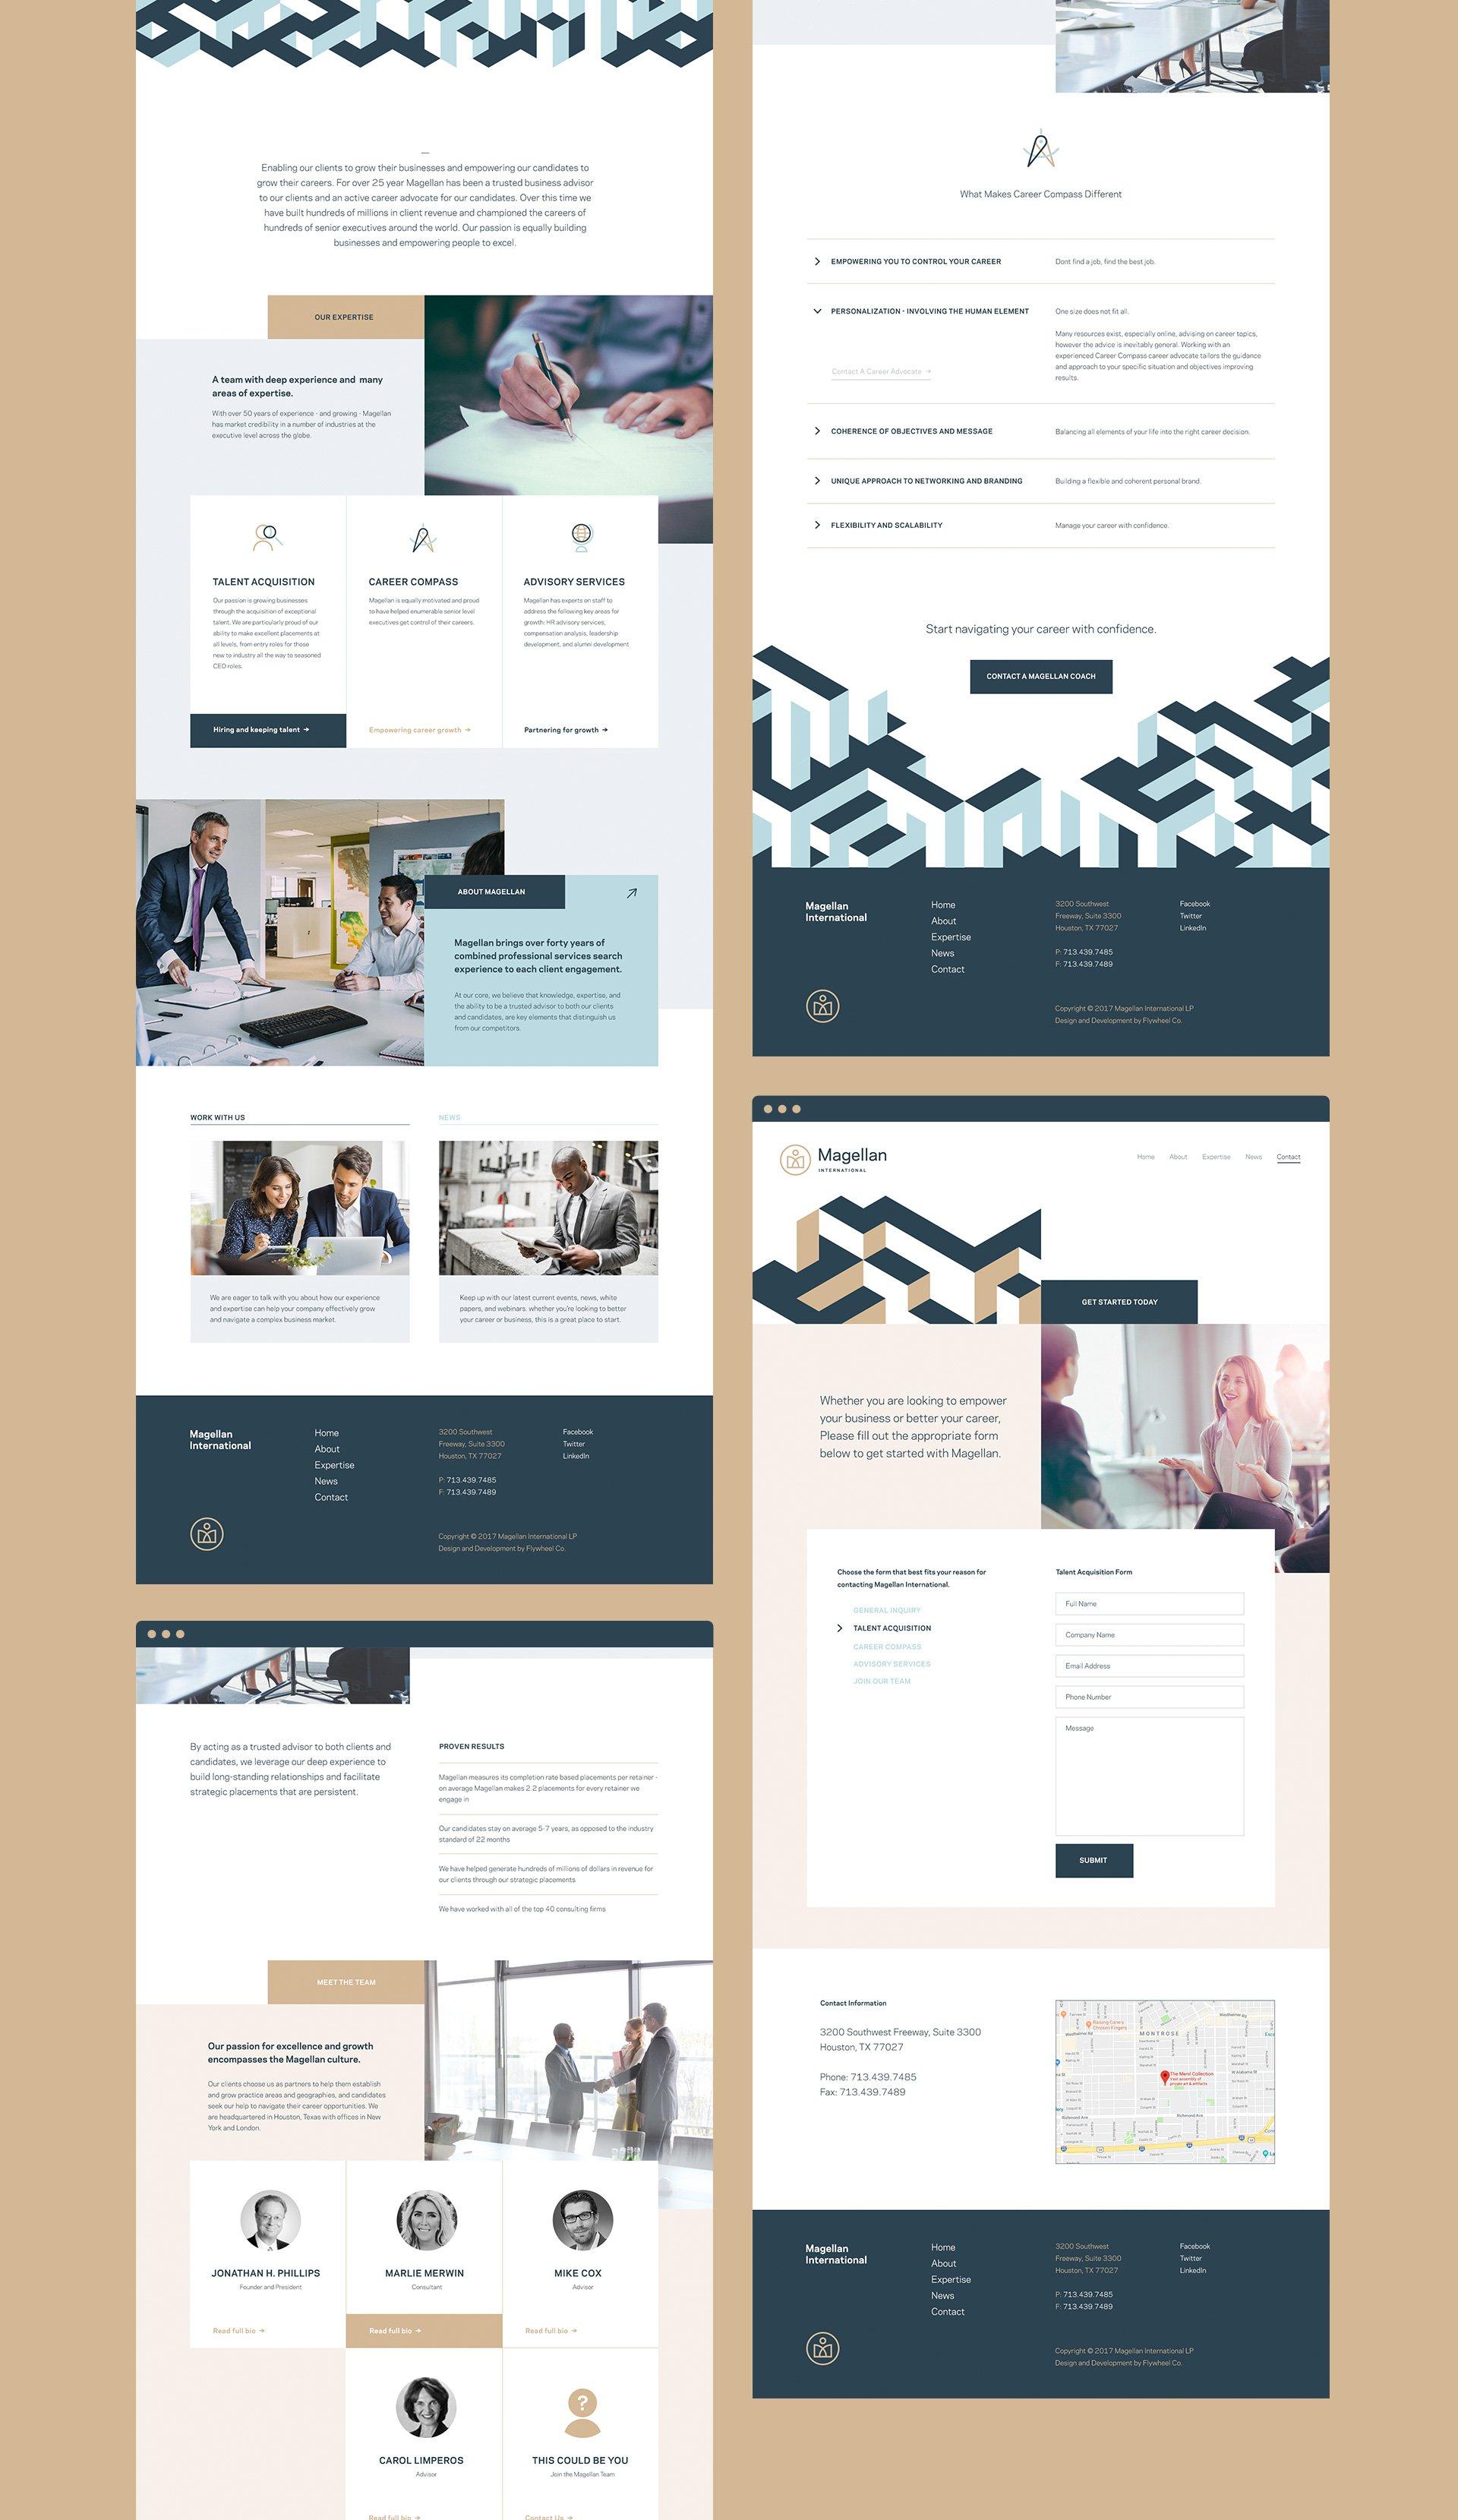 Magellan International Website Design Sample